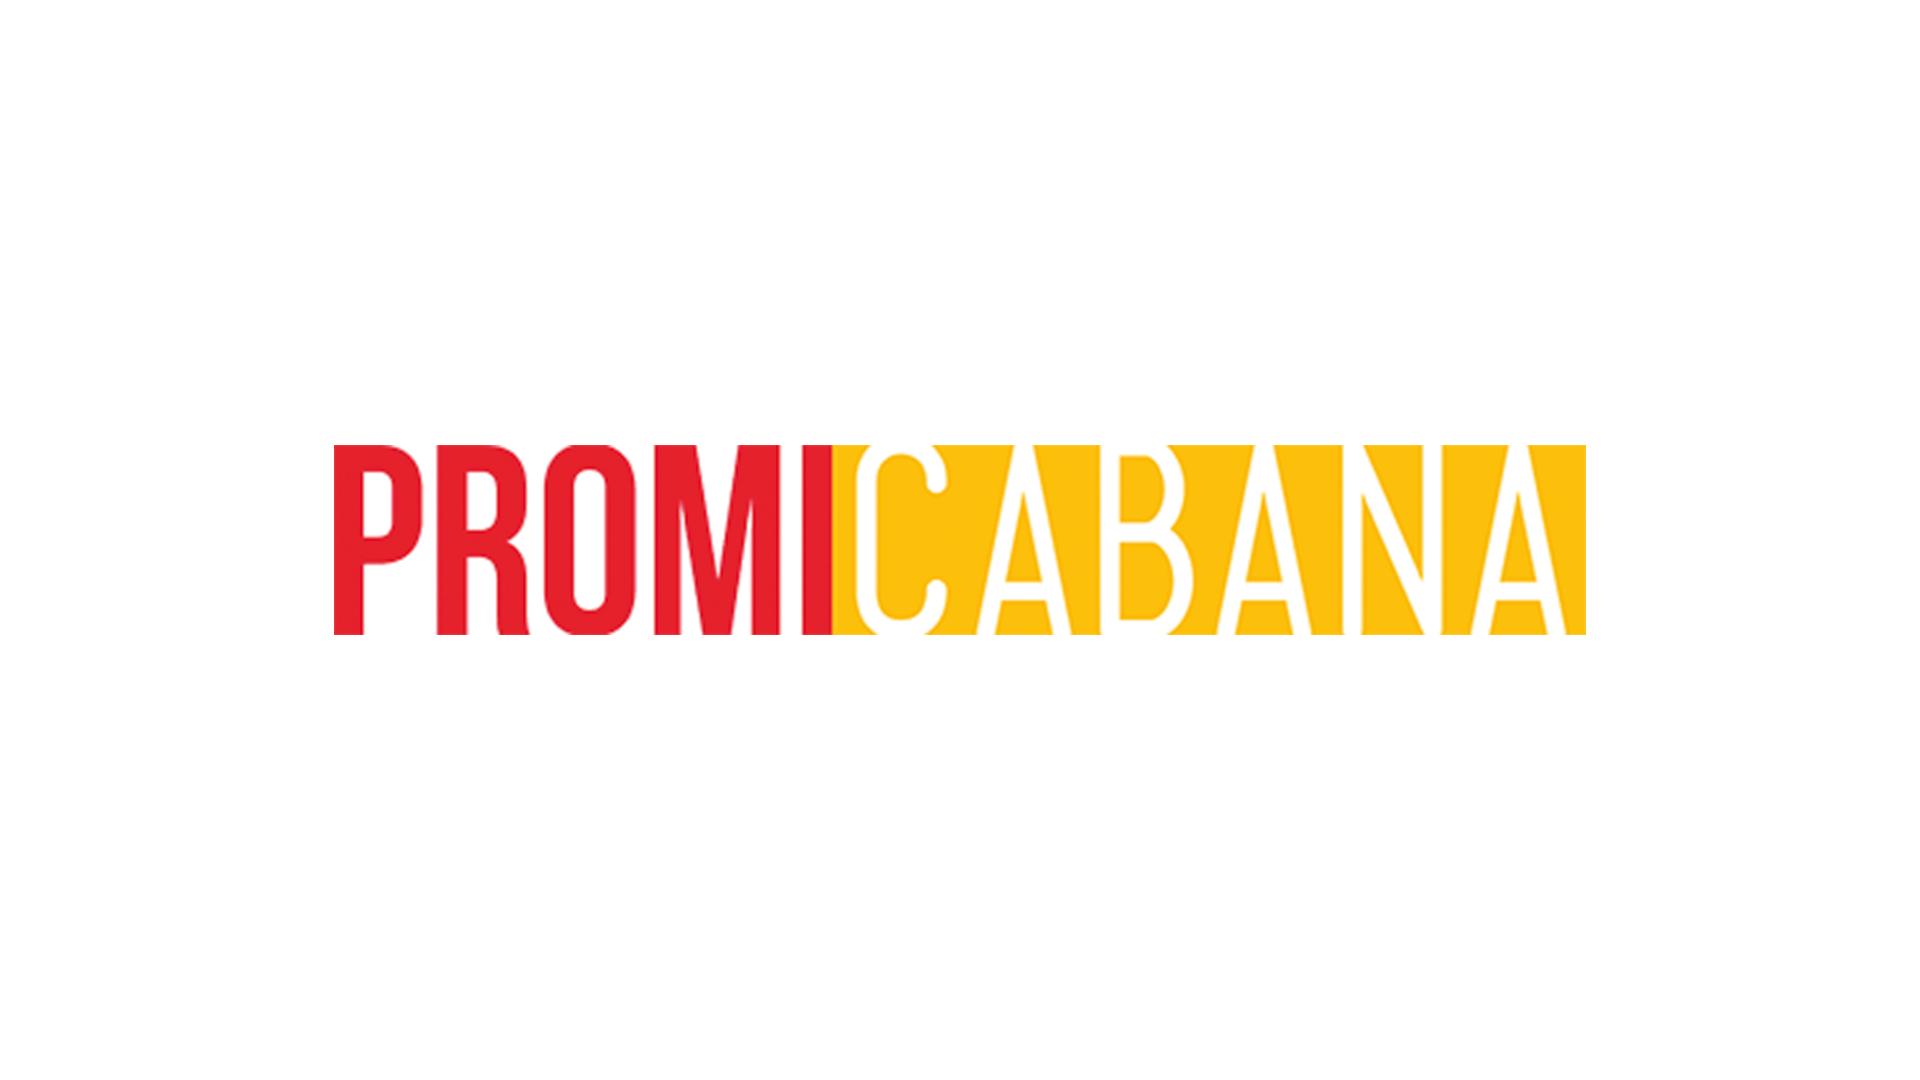 Lady Gaga Born This Way Vieo